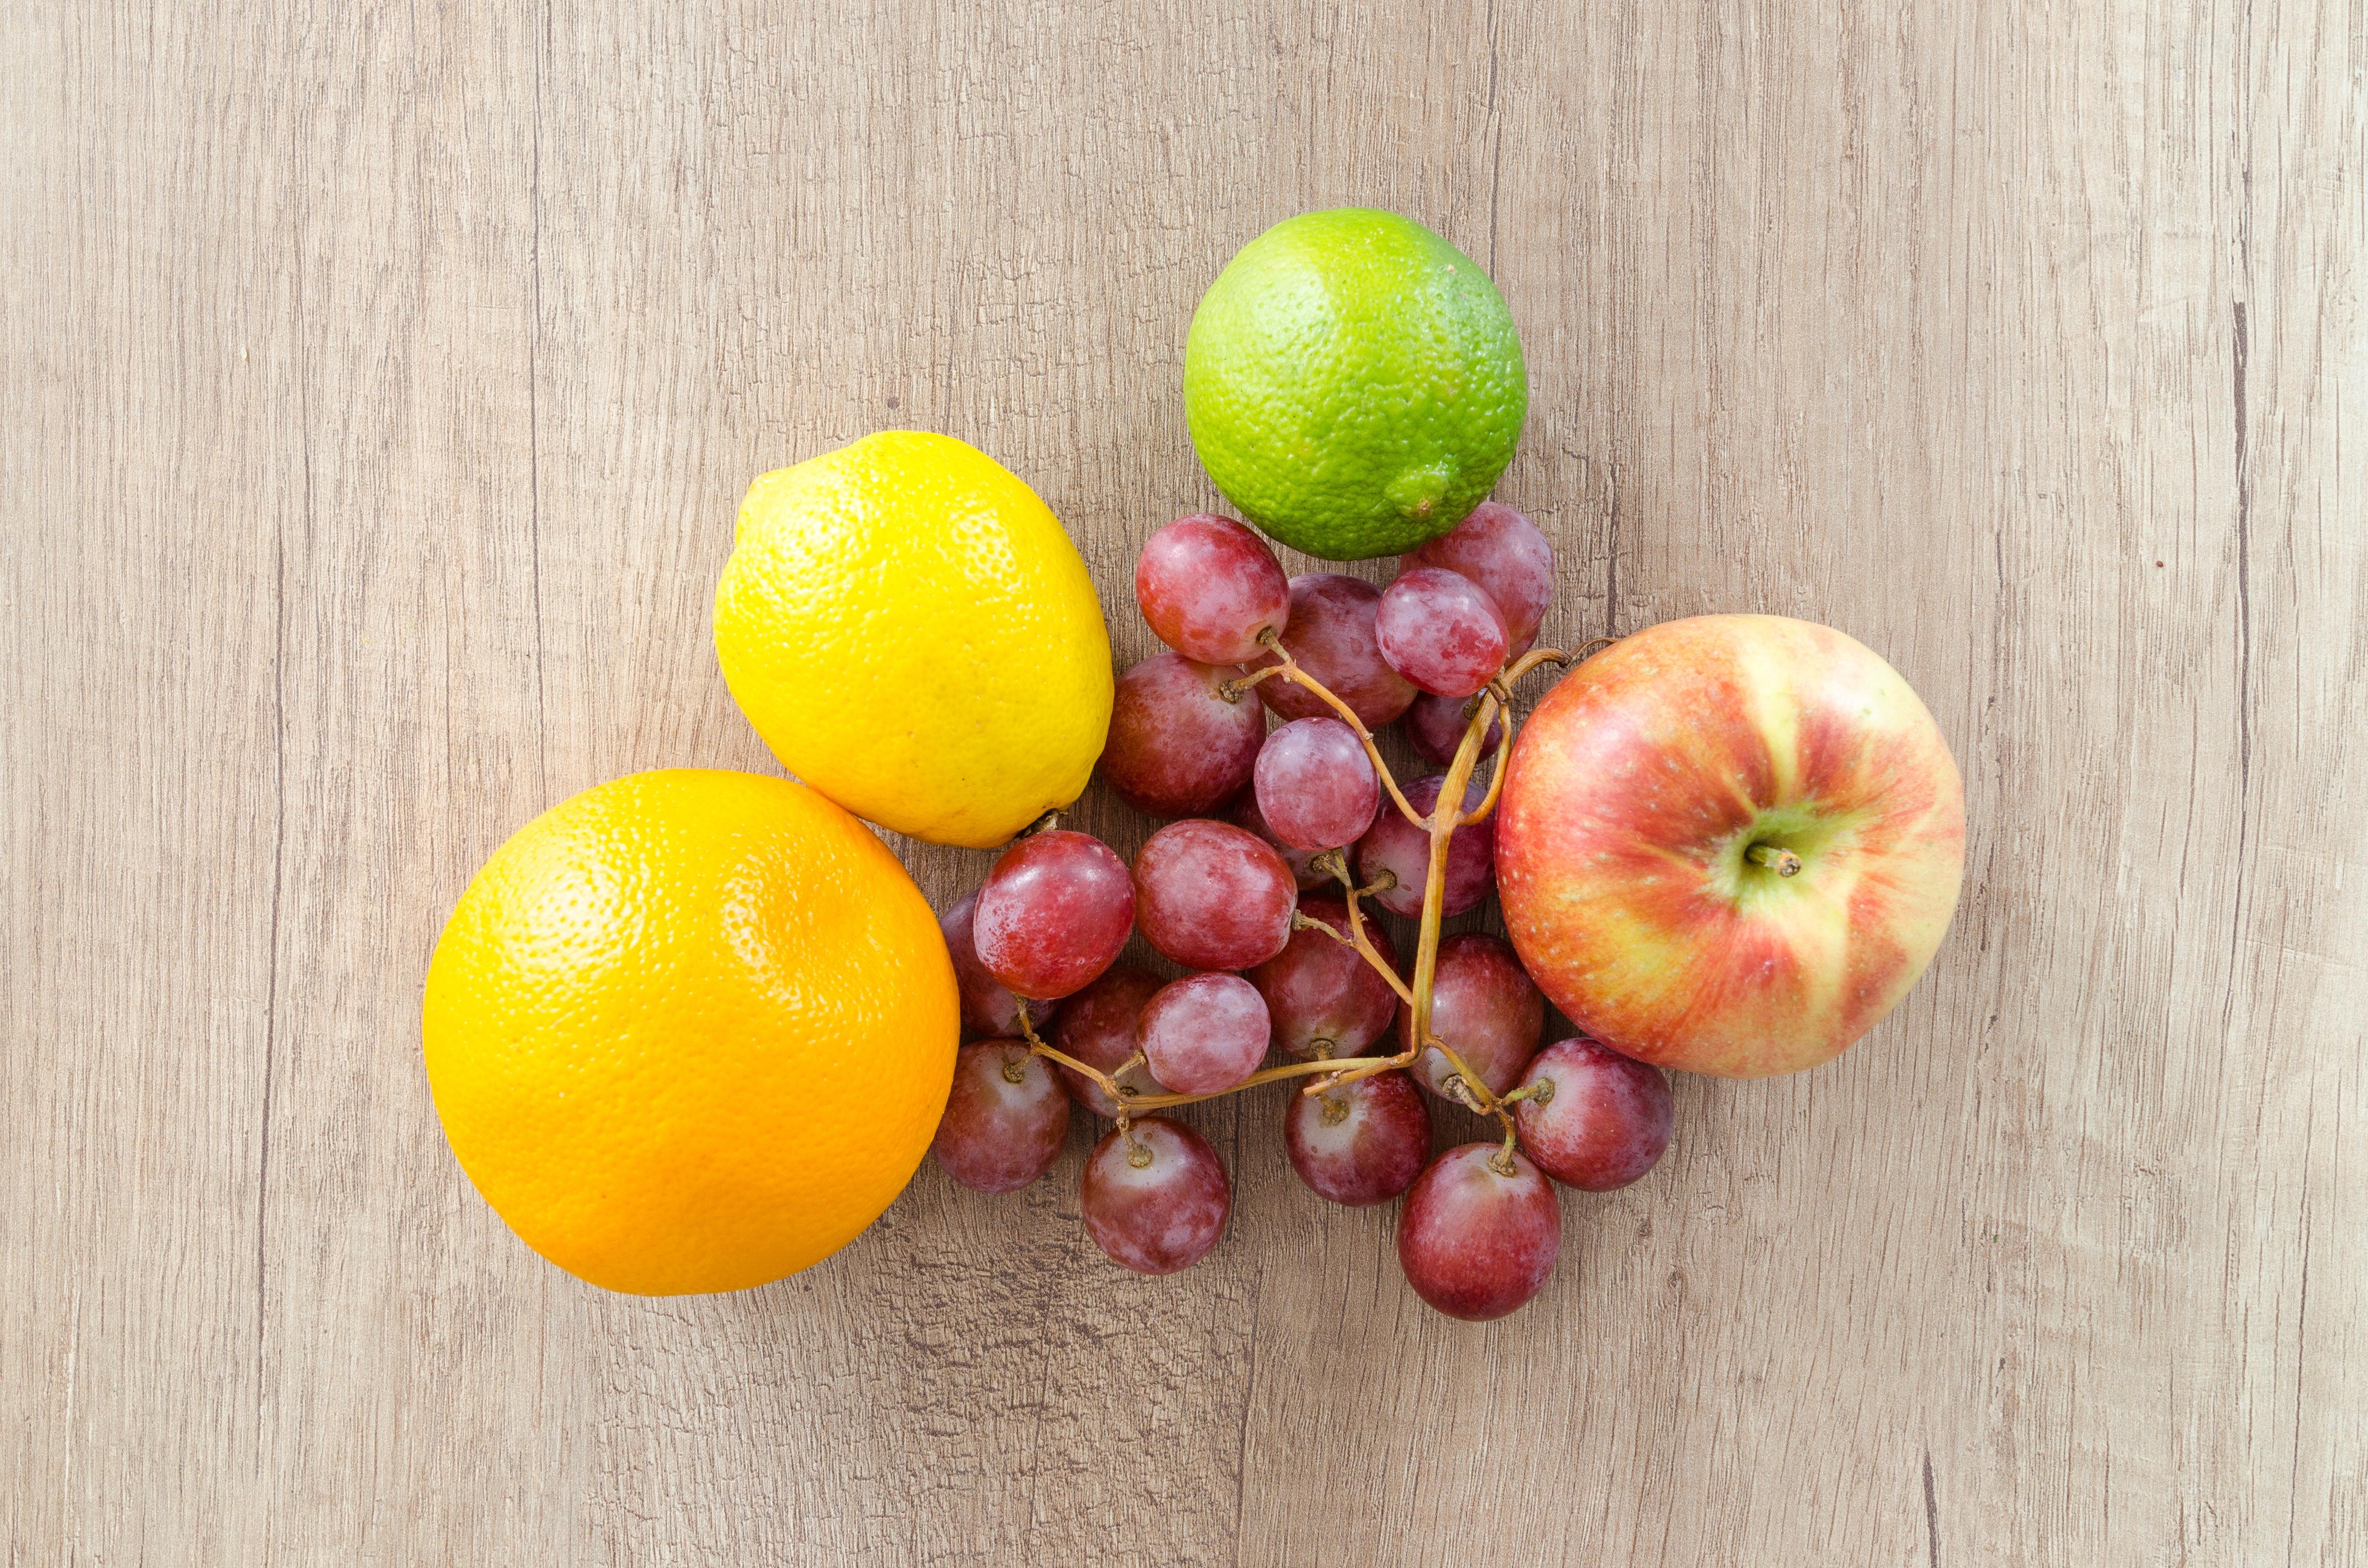 apple-citrus-citrus-fruits-616415.jpg